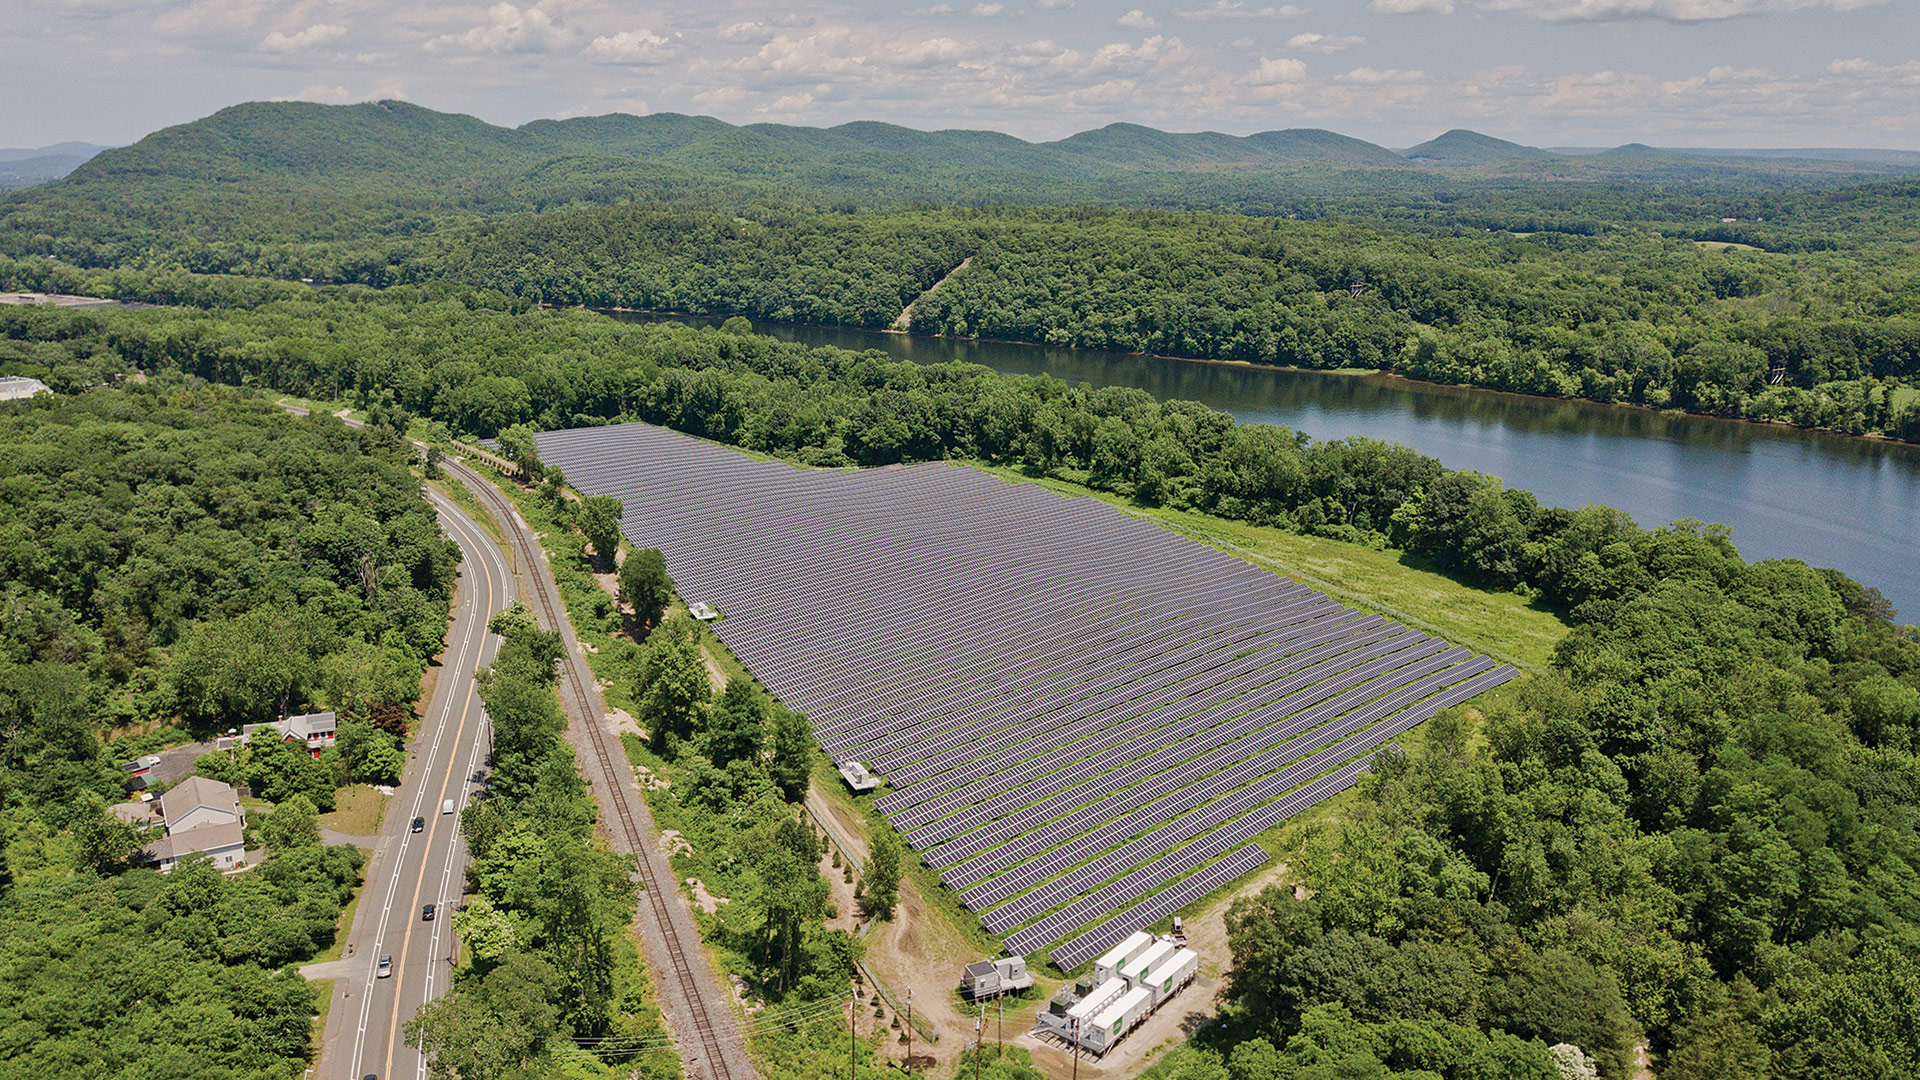 The Mount Tom Solar facility